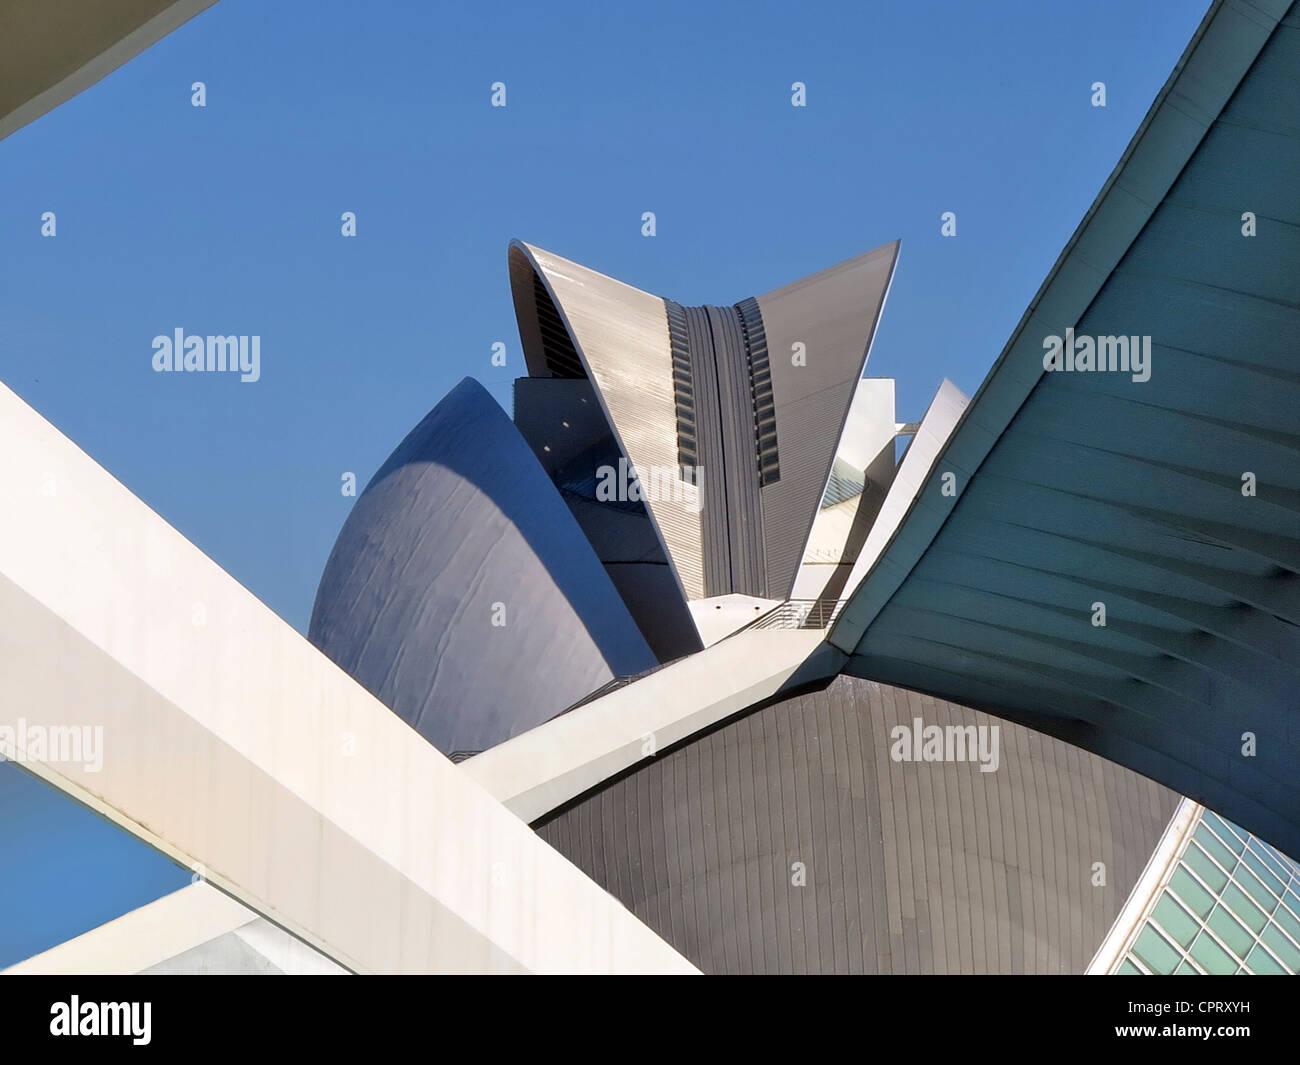 City of Arts and Sciences designed by Santiago Calatrava Valencia, Spain - Stock Image